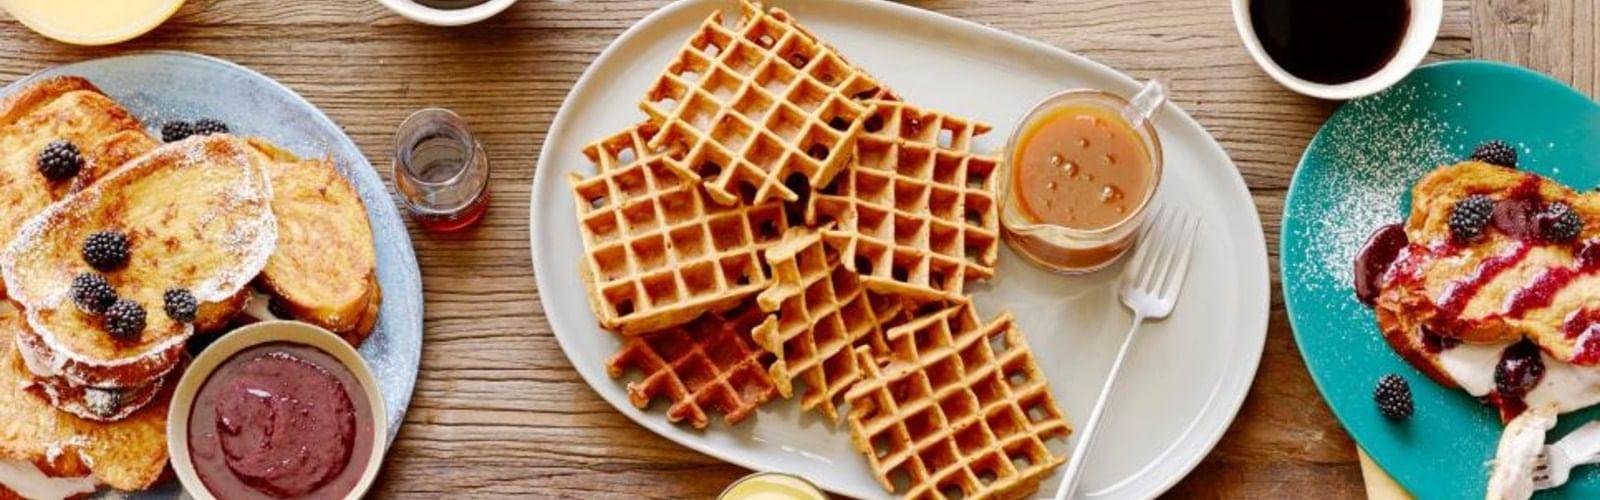 Crispy Waffle Plates with sauce at Grosvenor Hotel Restaurant